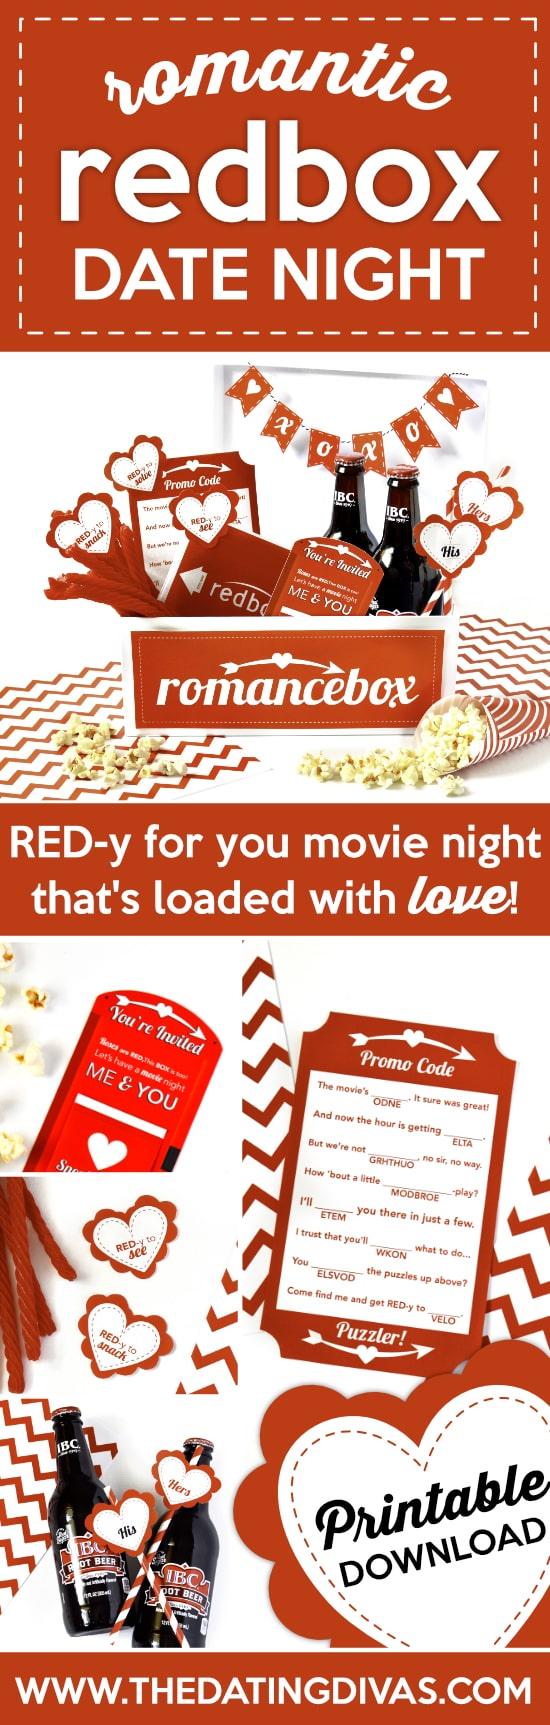 Romantic Redbox Date